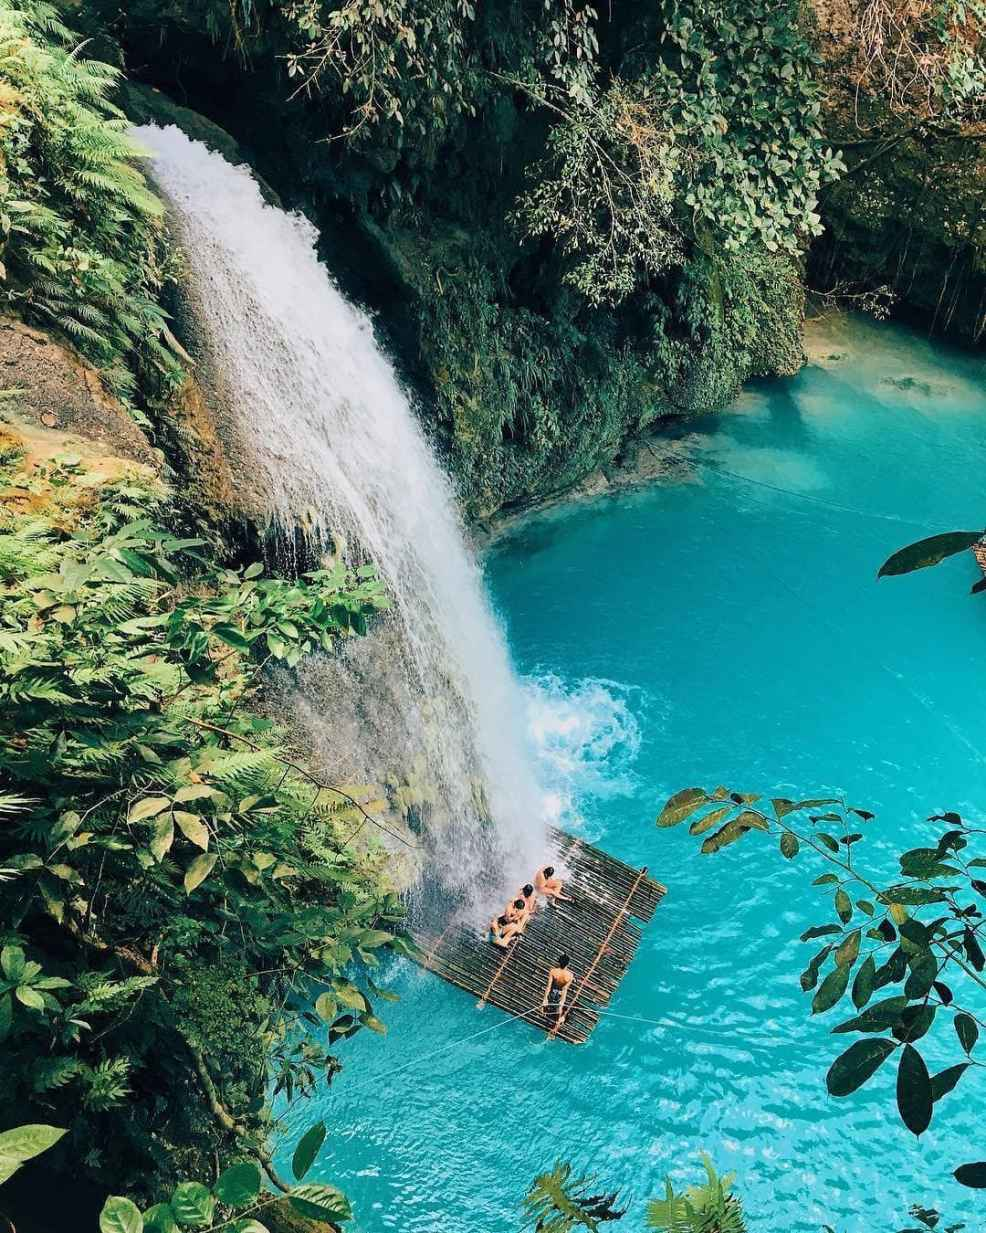 How To Get to Moalboal, Kawasan Falls